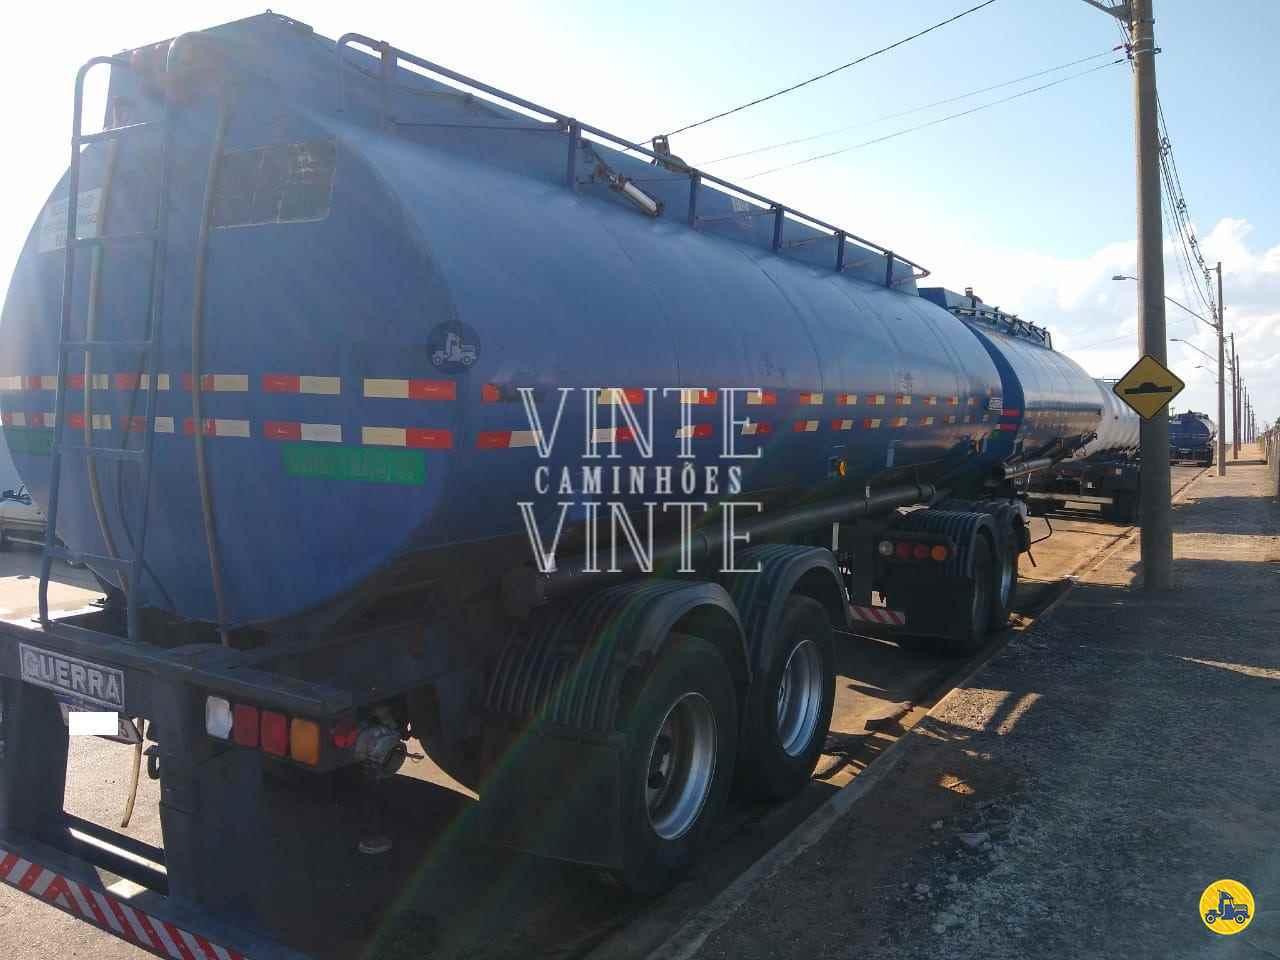 TANQUE AÇO de Vinte-Vinte Caminhões - SANTO ANDRE/SP